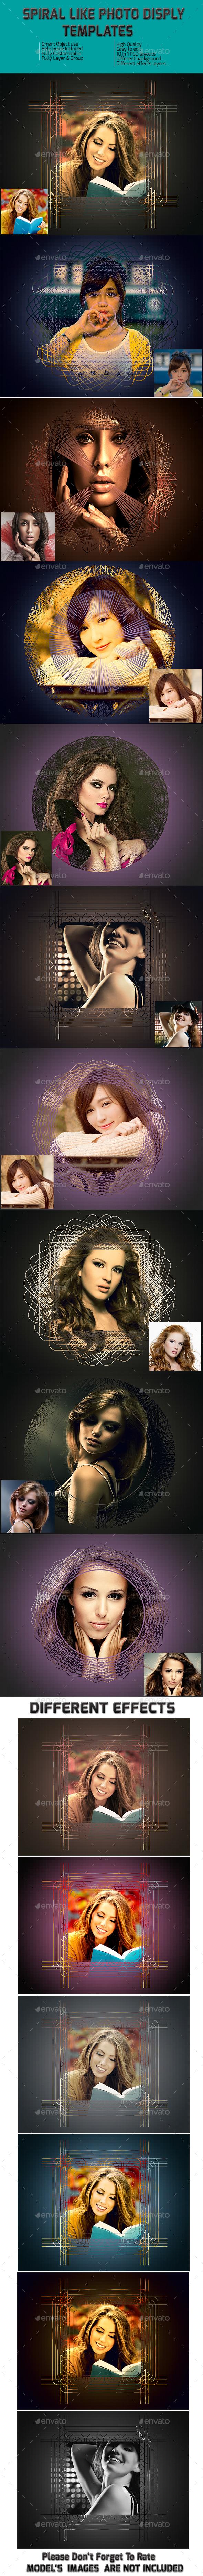 Spiral Like Frame Templates - Photo Templates Graphics